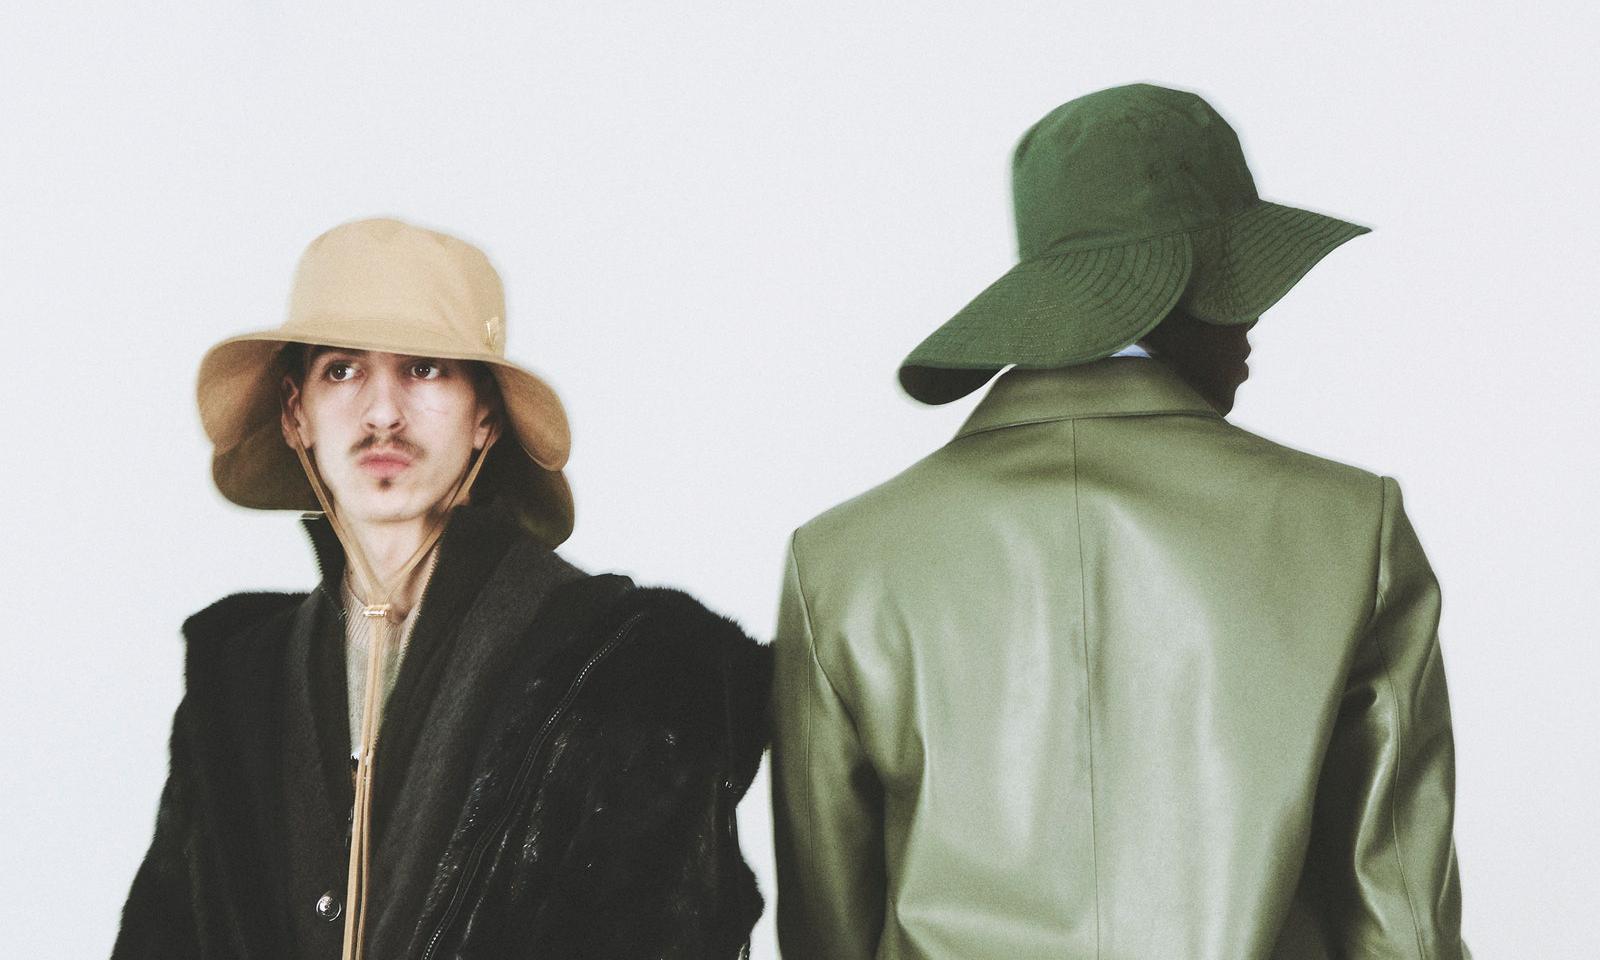 Louis Vuitton 男装 2021 早春系列发布先期预览